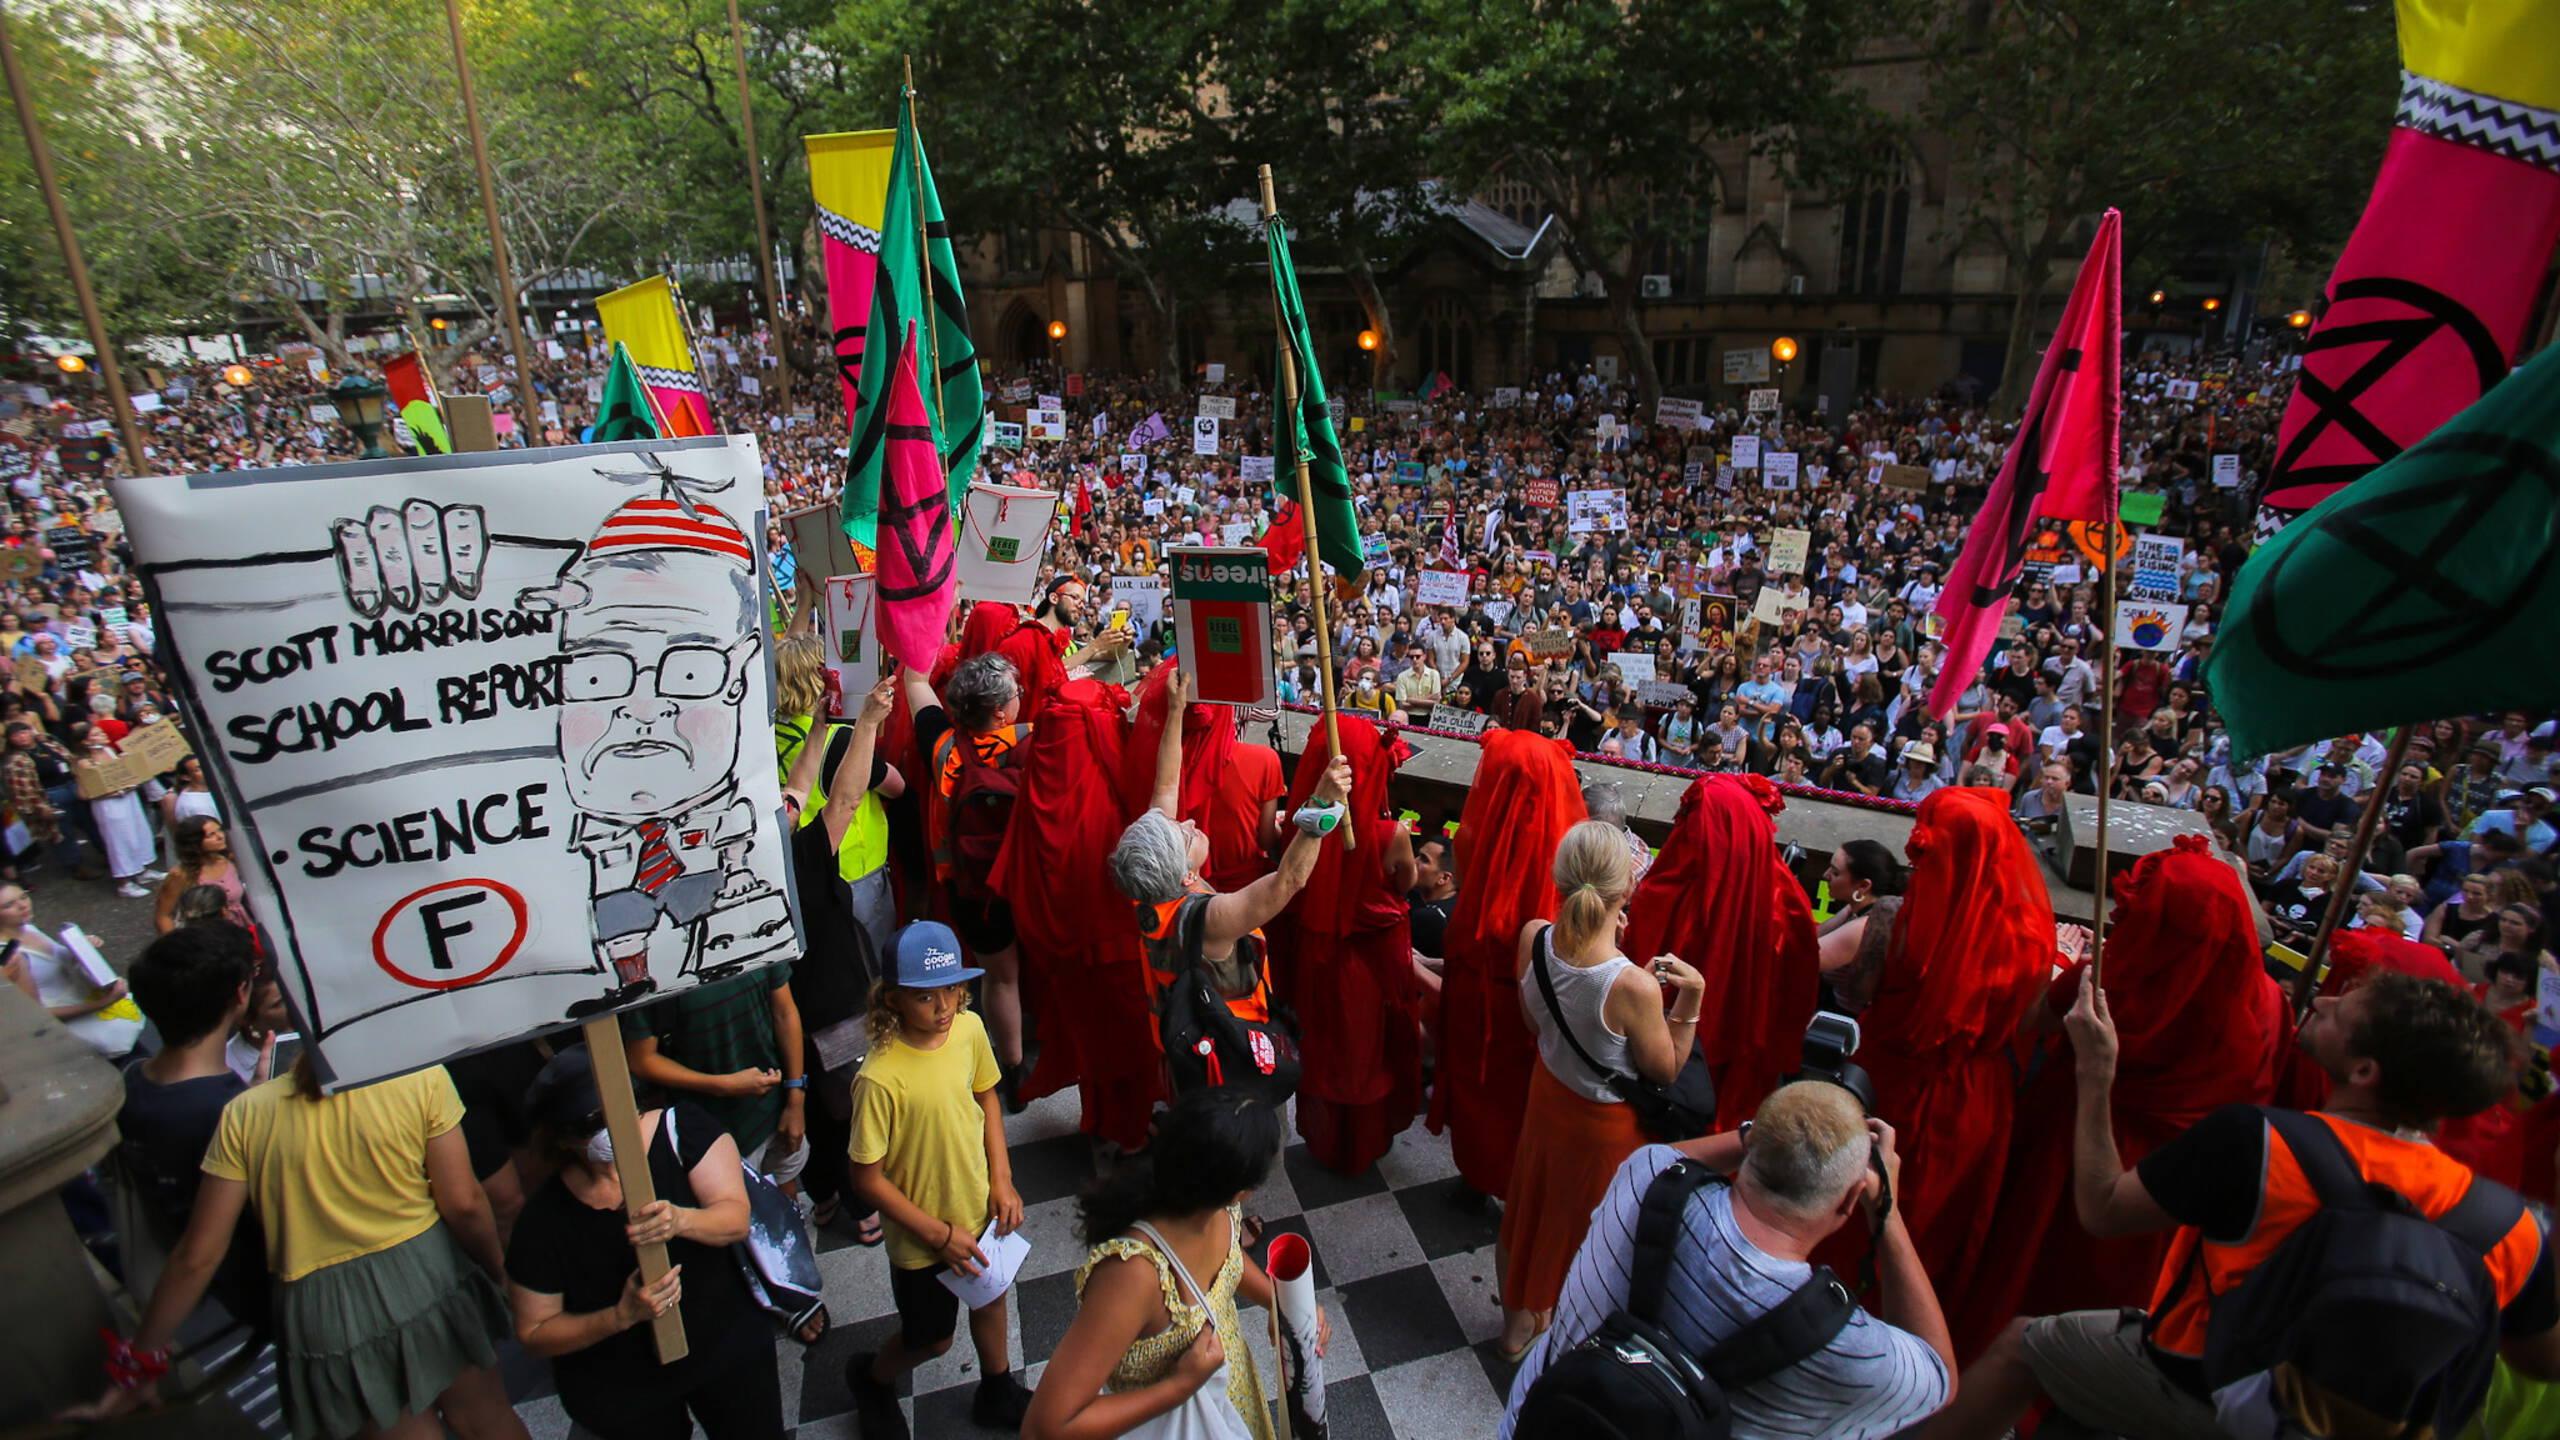 Anti-climate change demonstrators in Australia, EPA photo